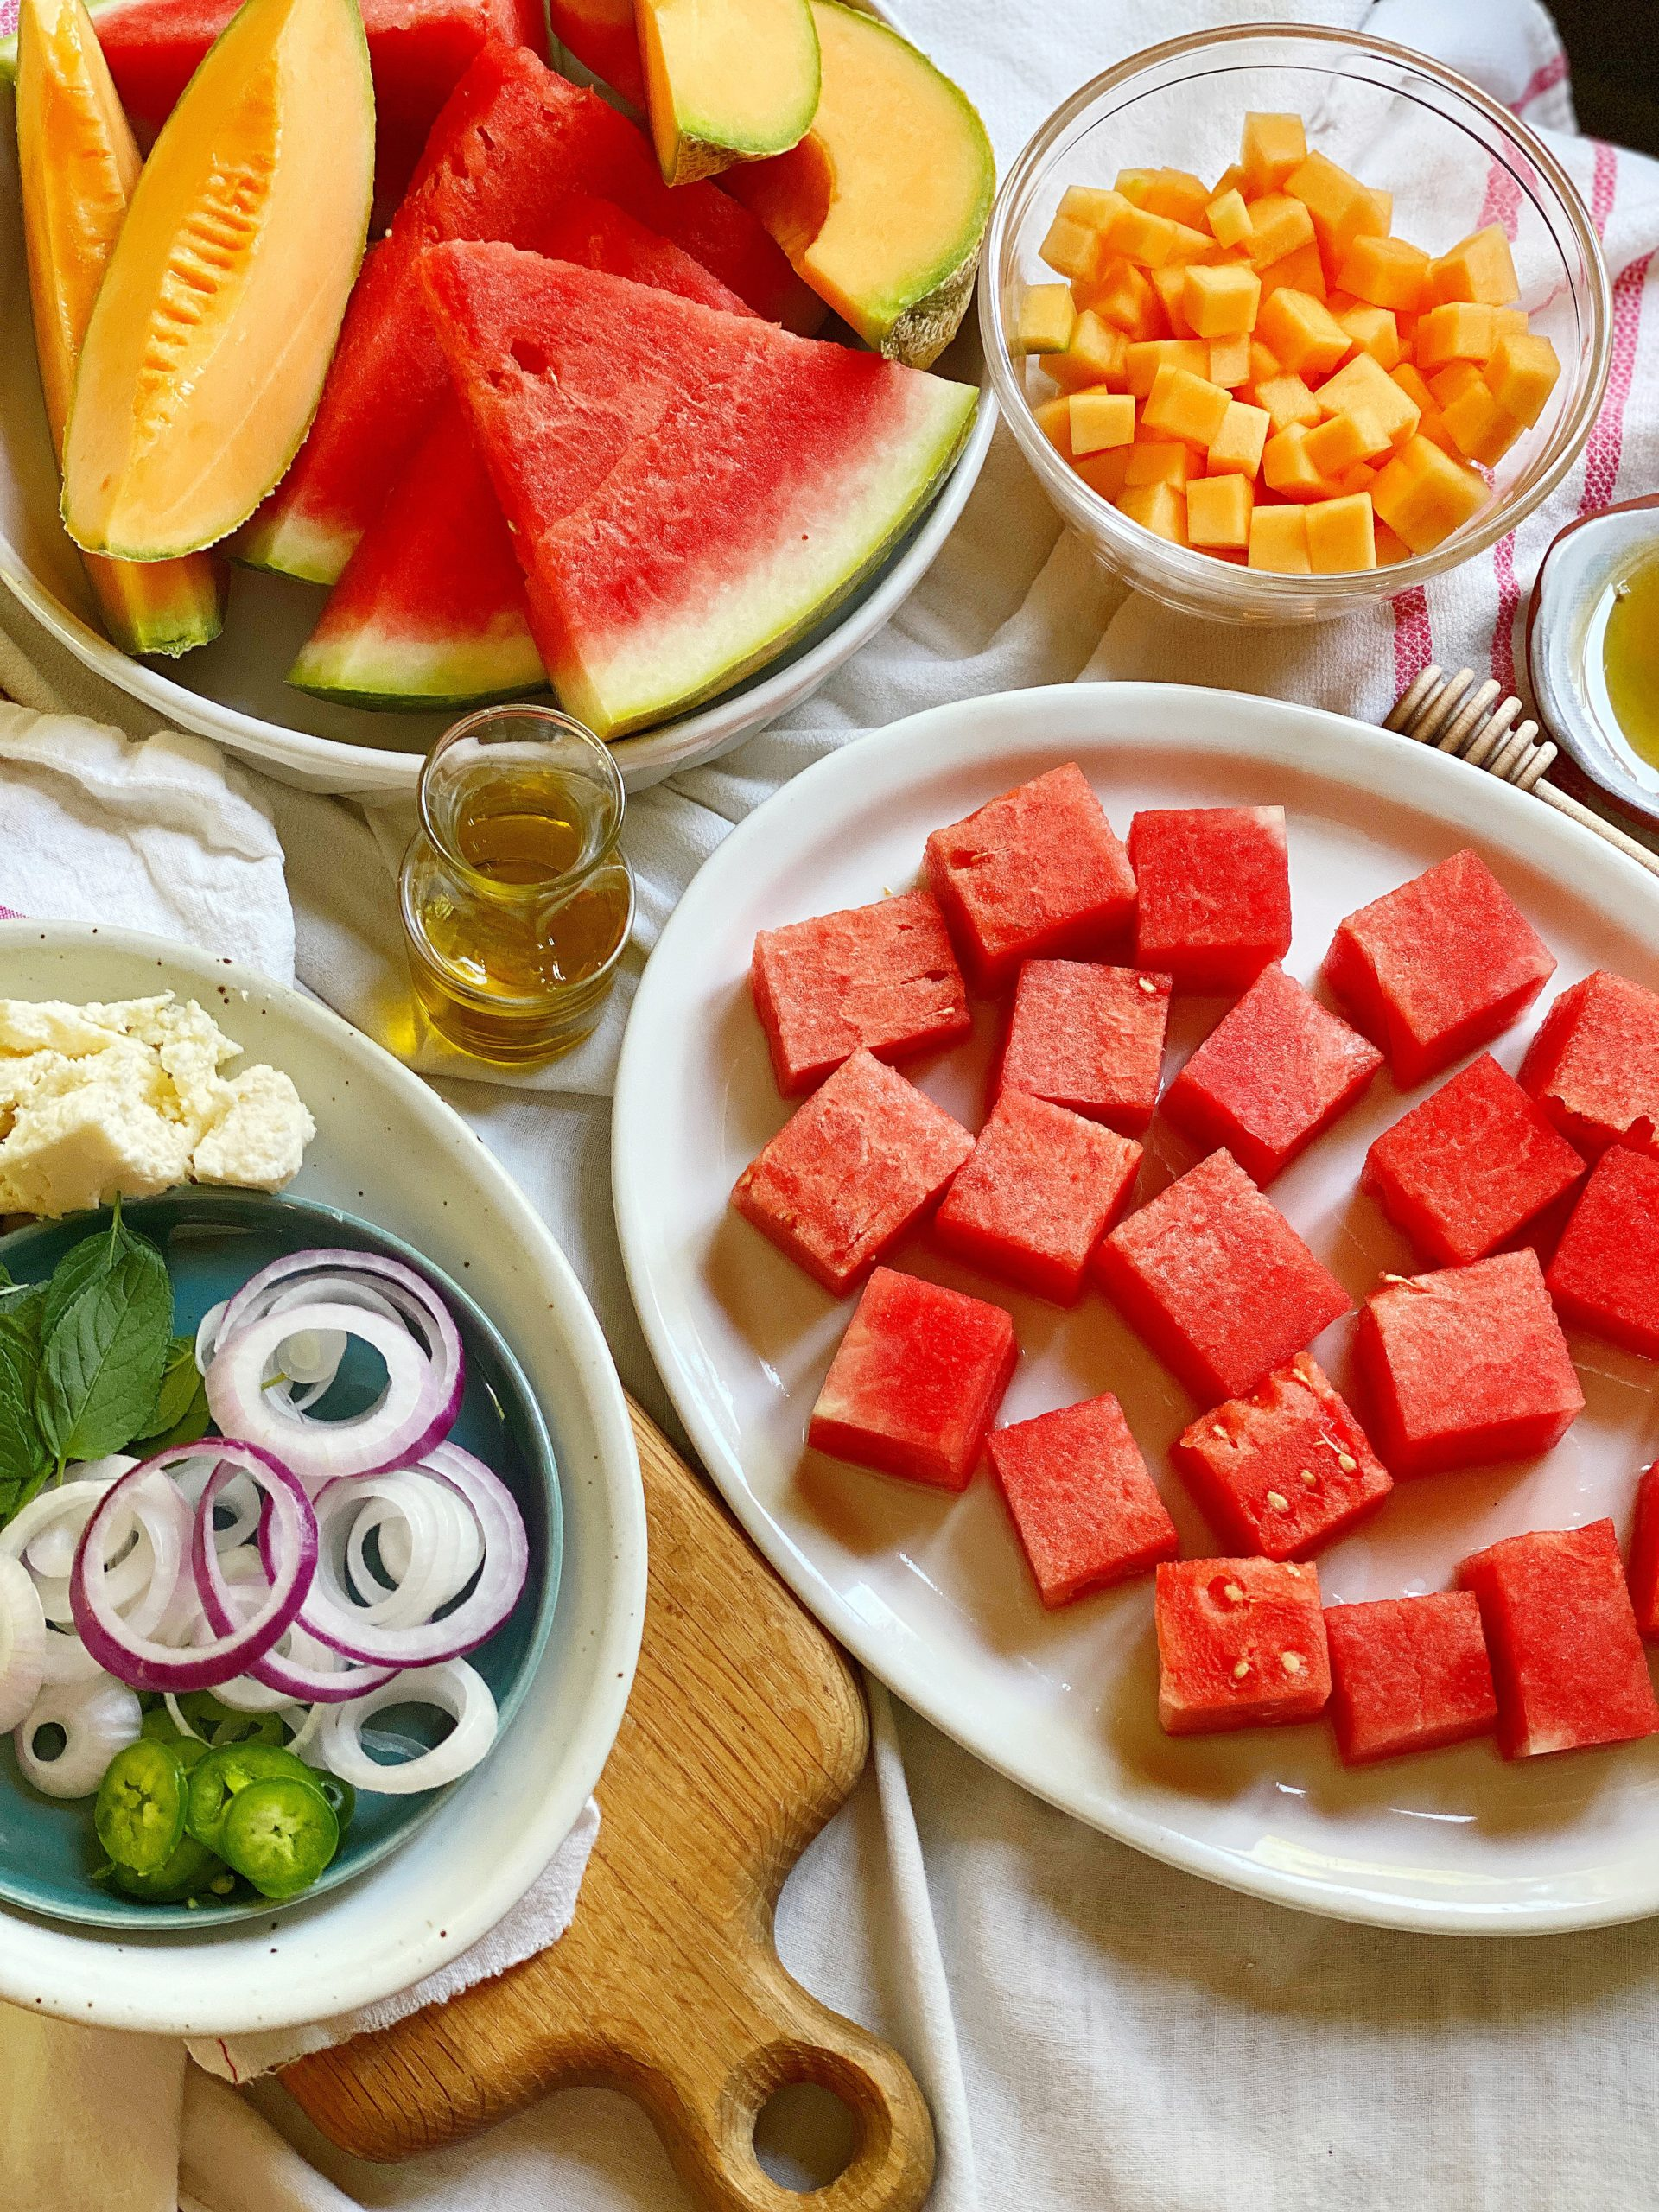 mojito melon salad ingredients